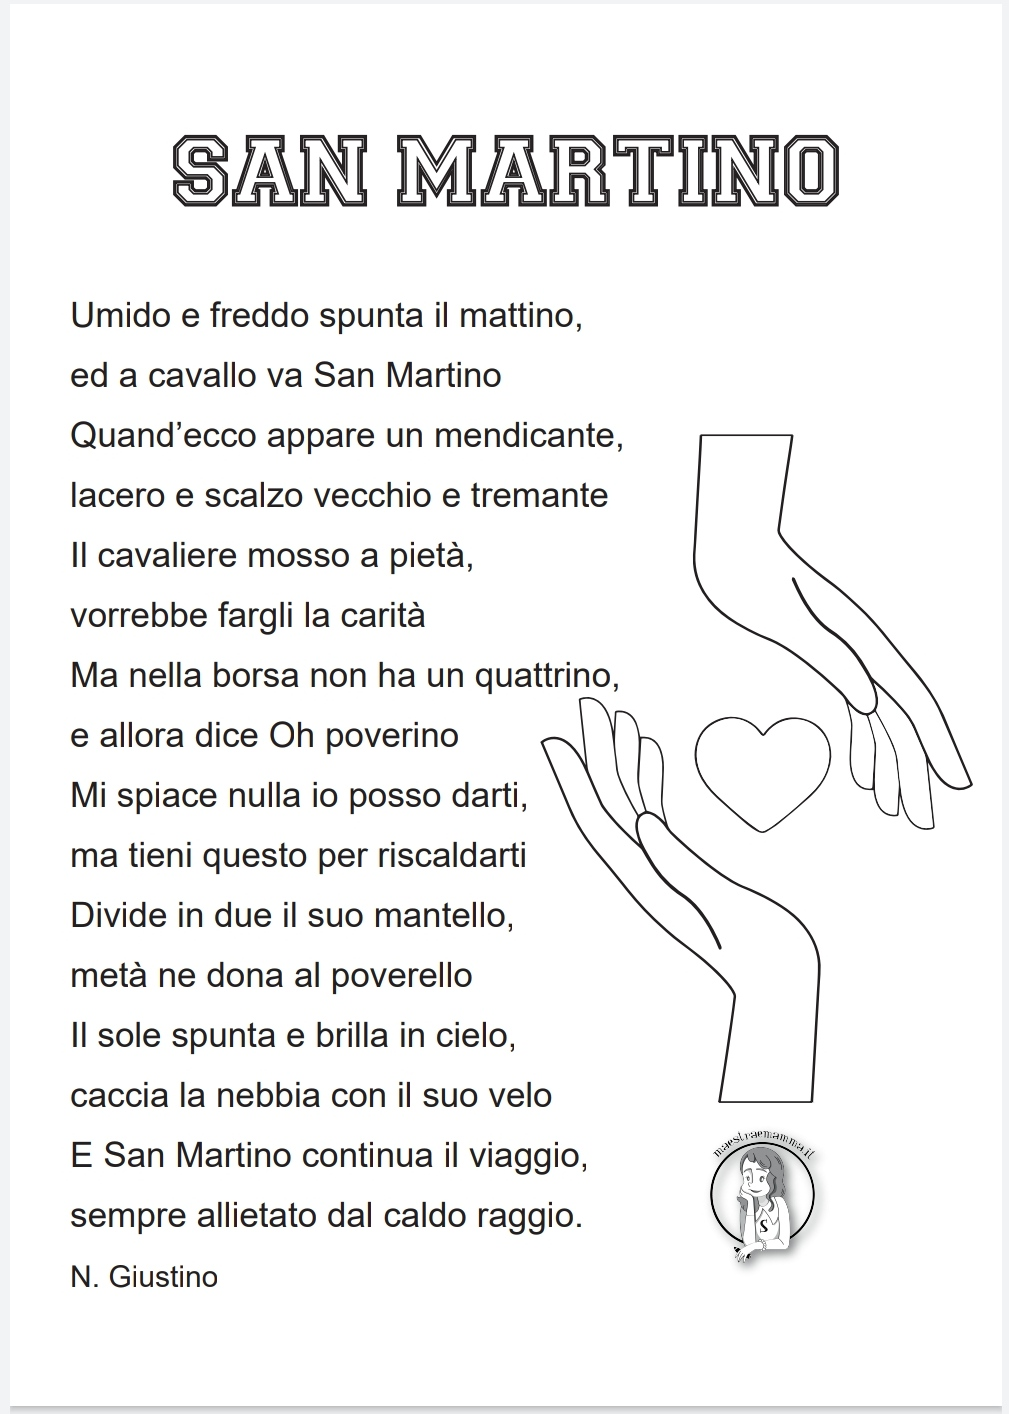 San Martino - poesia